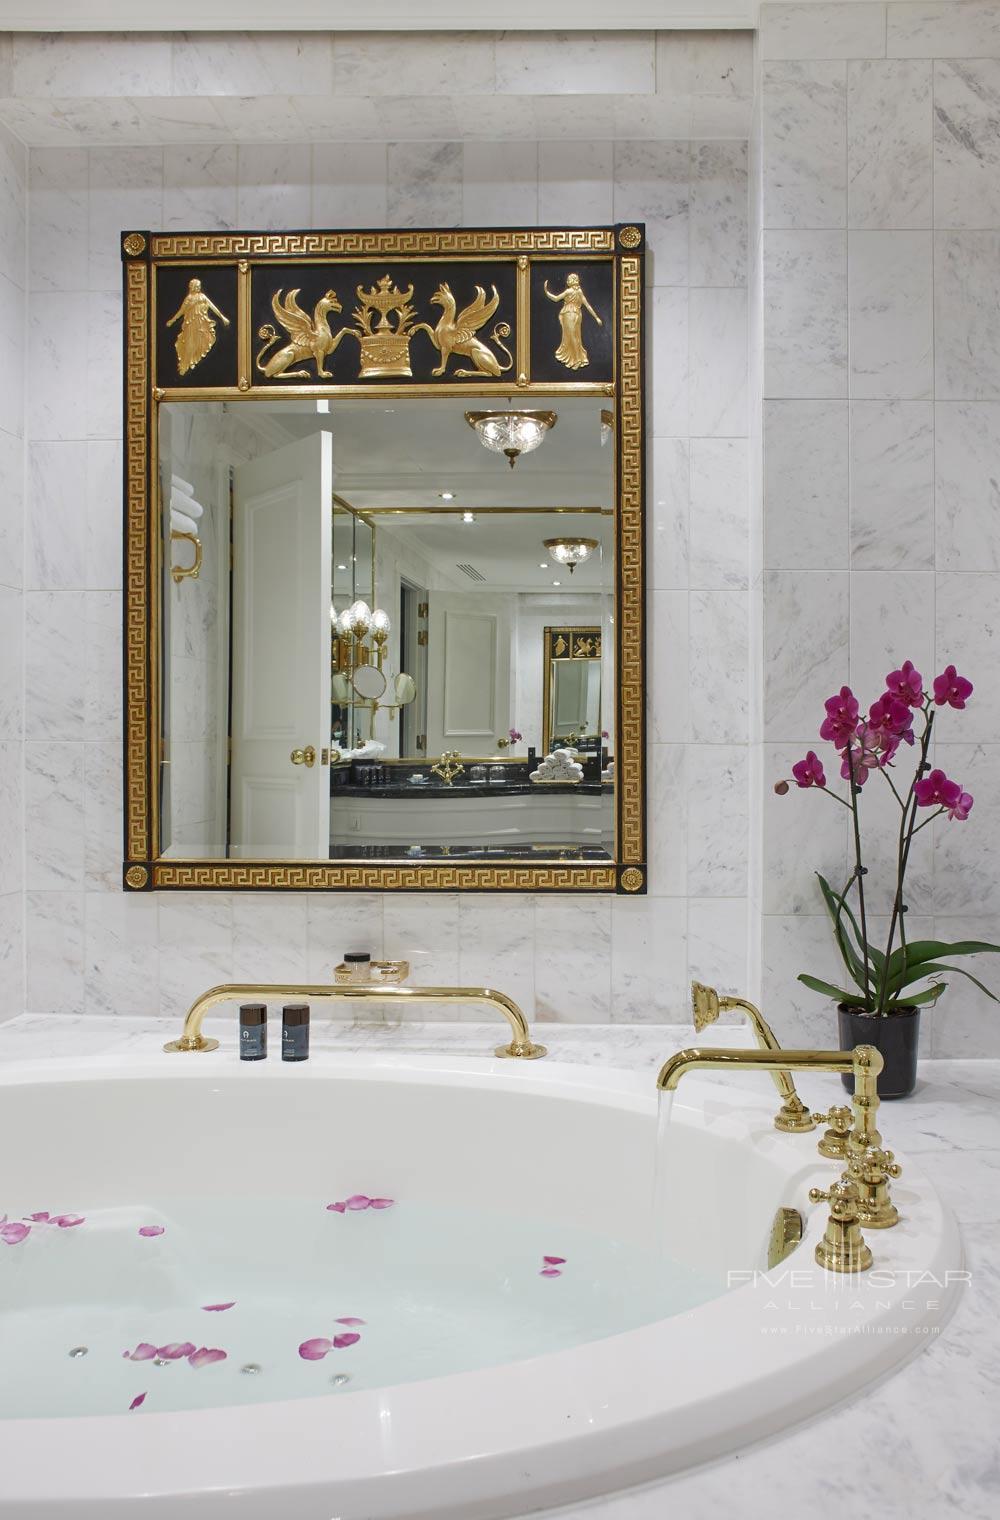 Royal Suite Bath at Steigenberger Wiltchers BrusselsBelgium